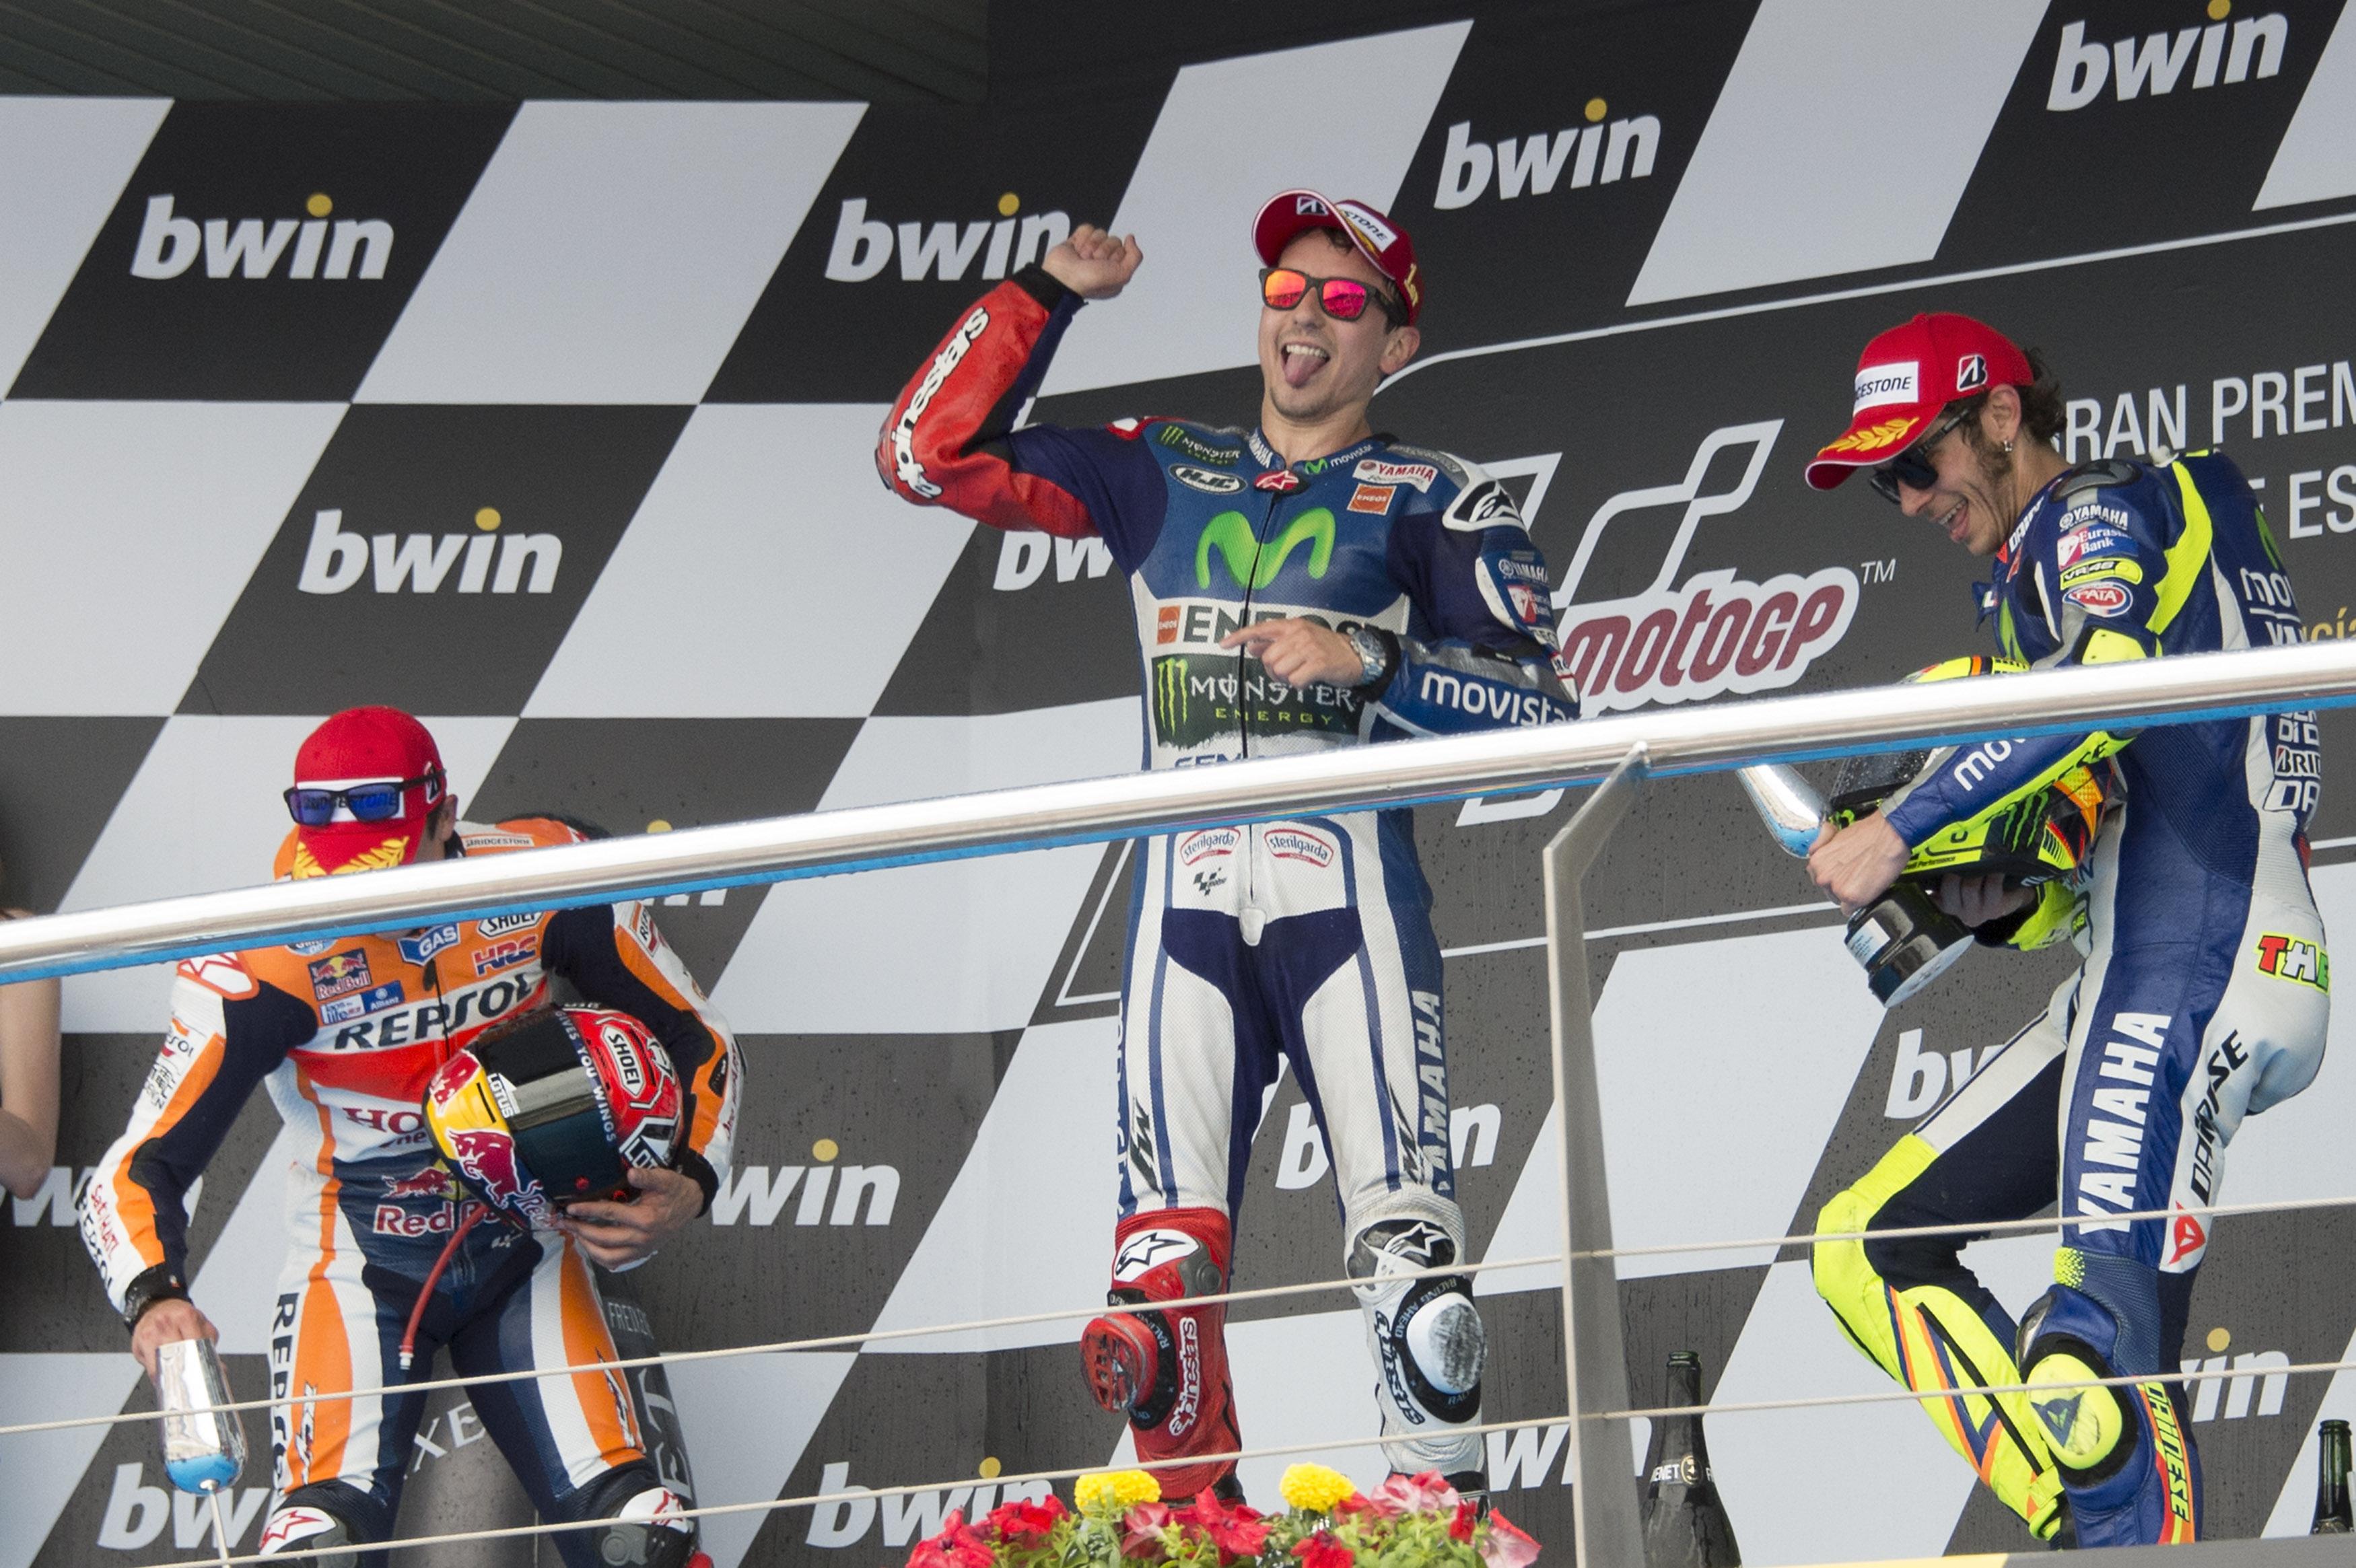 MotoGP 2015: championship standings after Jerez